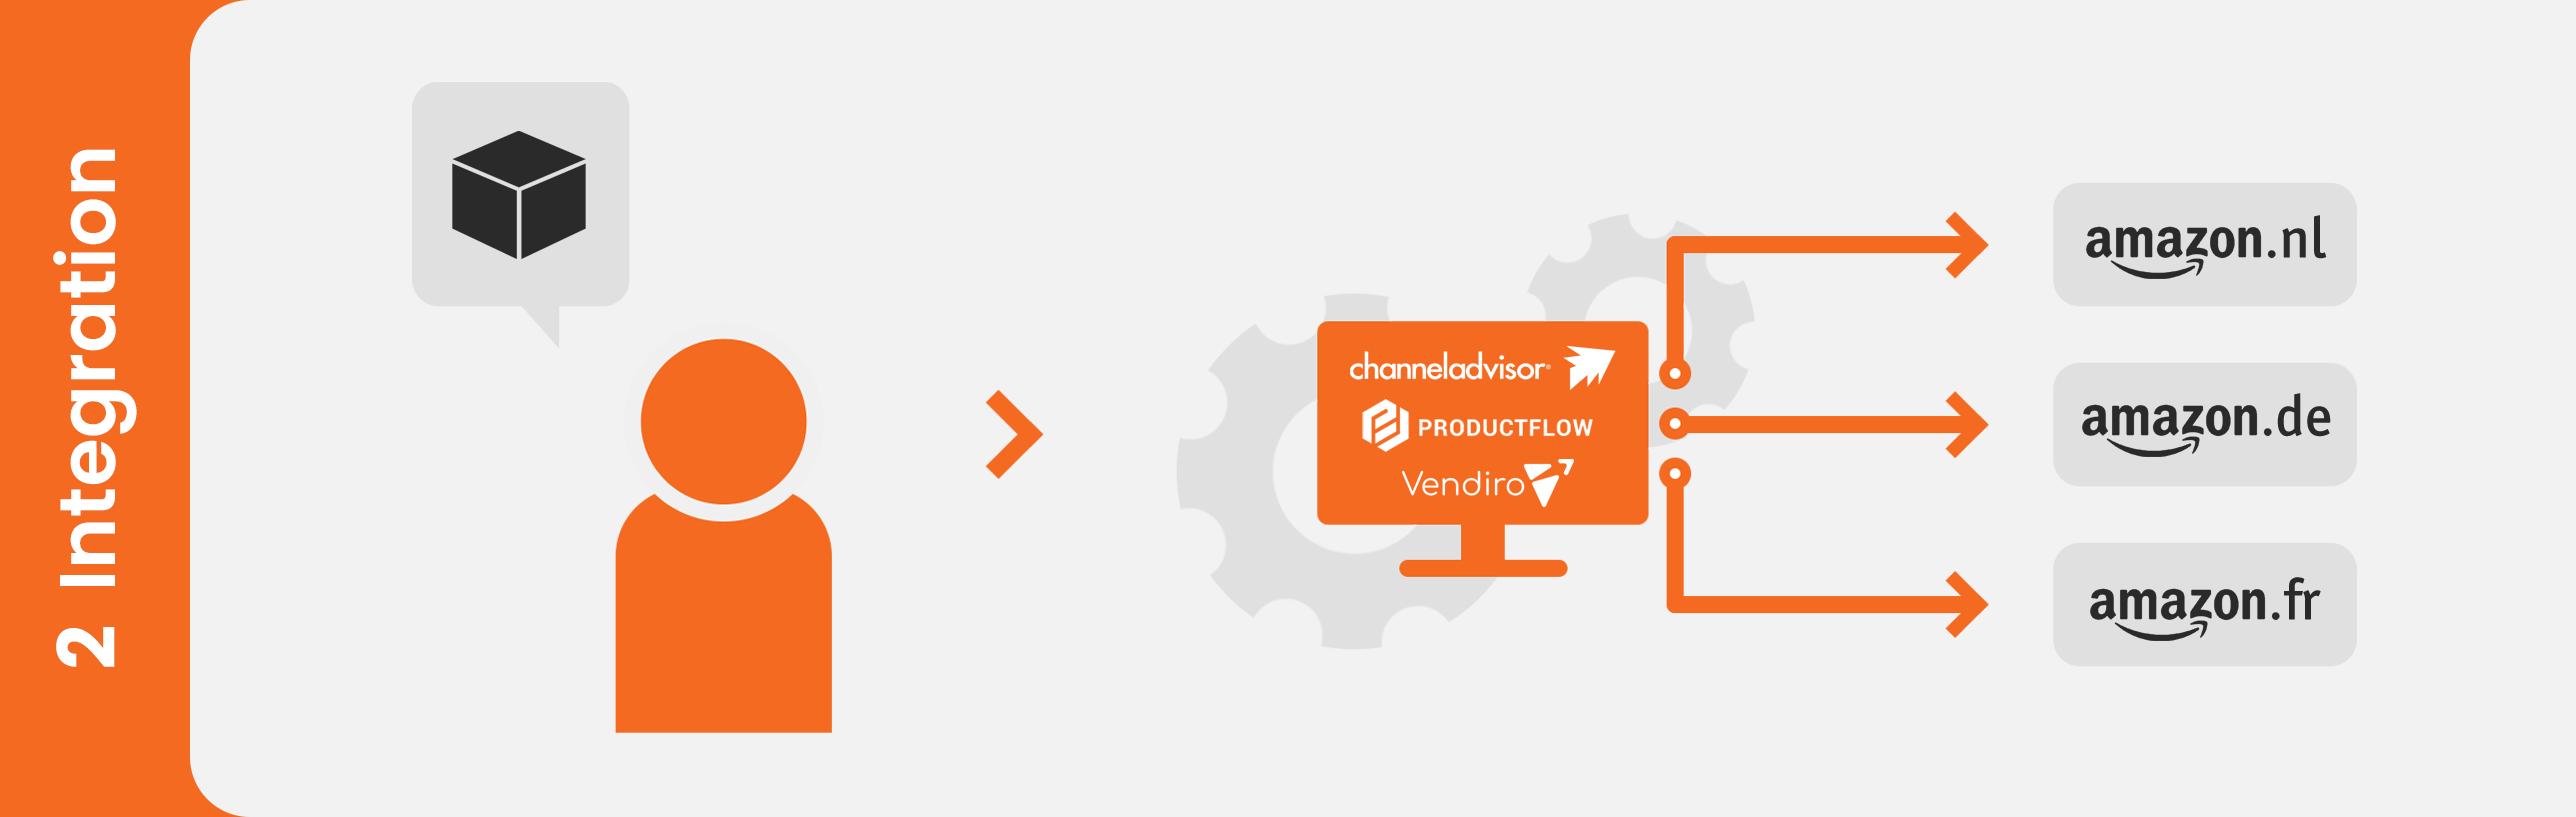 Integrator, Amazon integration, Channeladvisor, Channelengine, Productflow, Vendiro